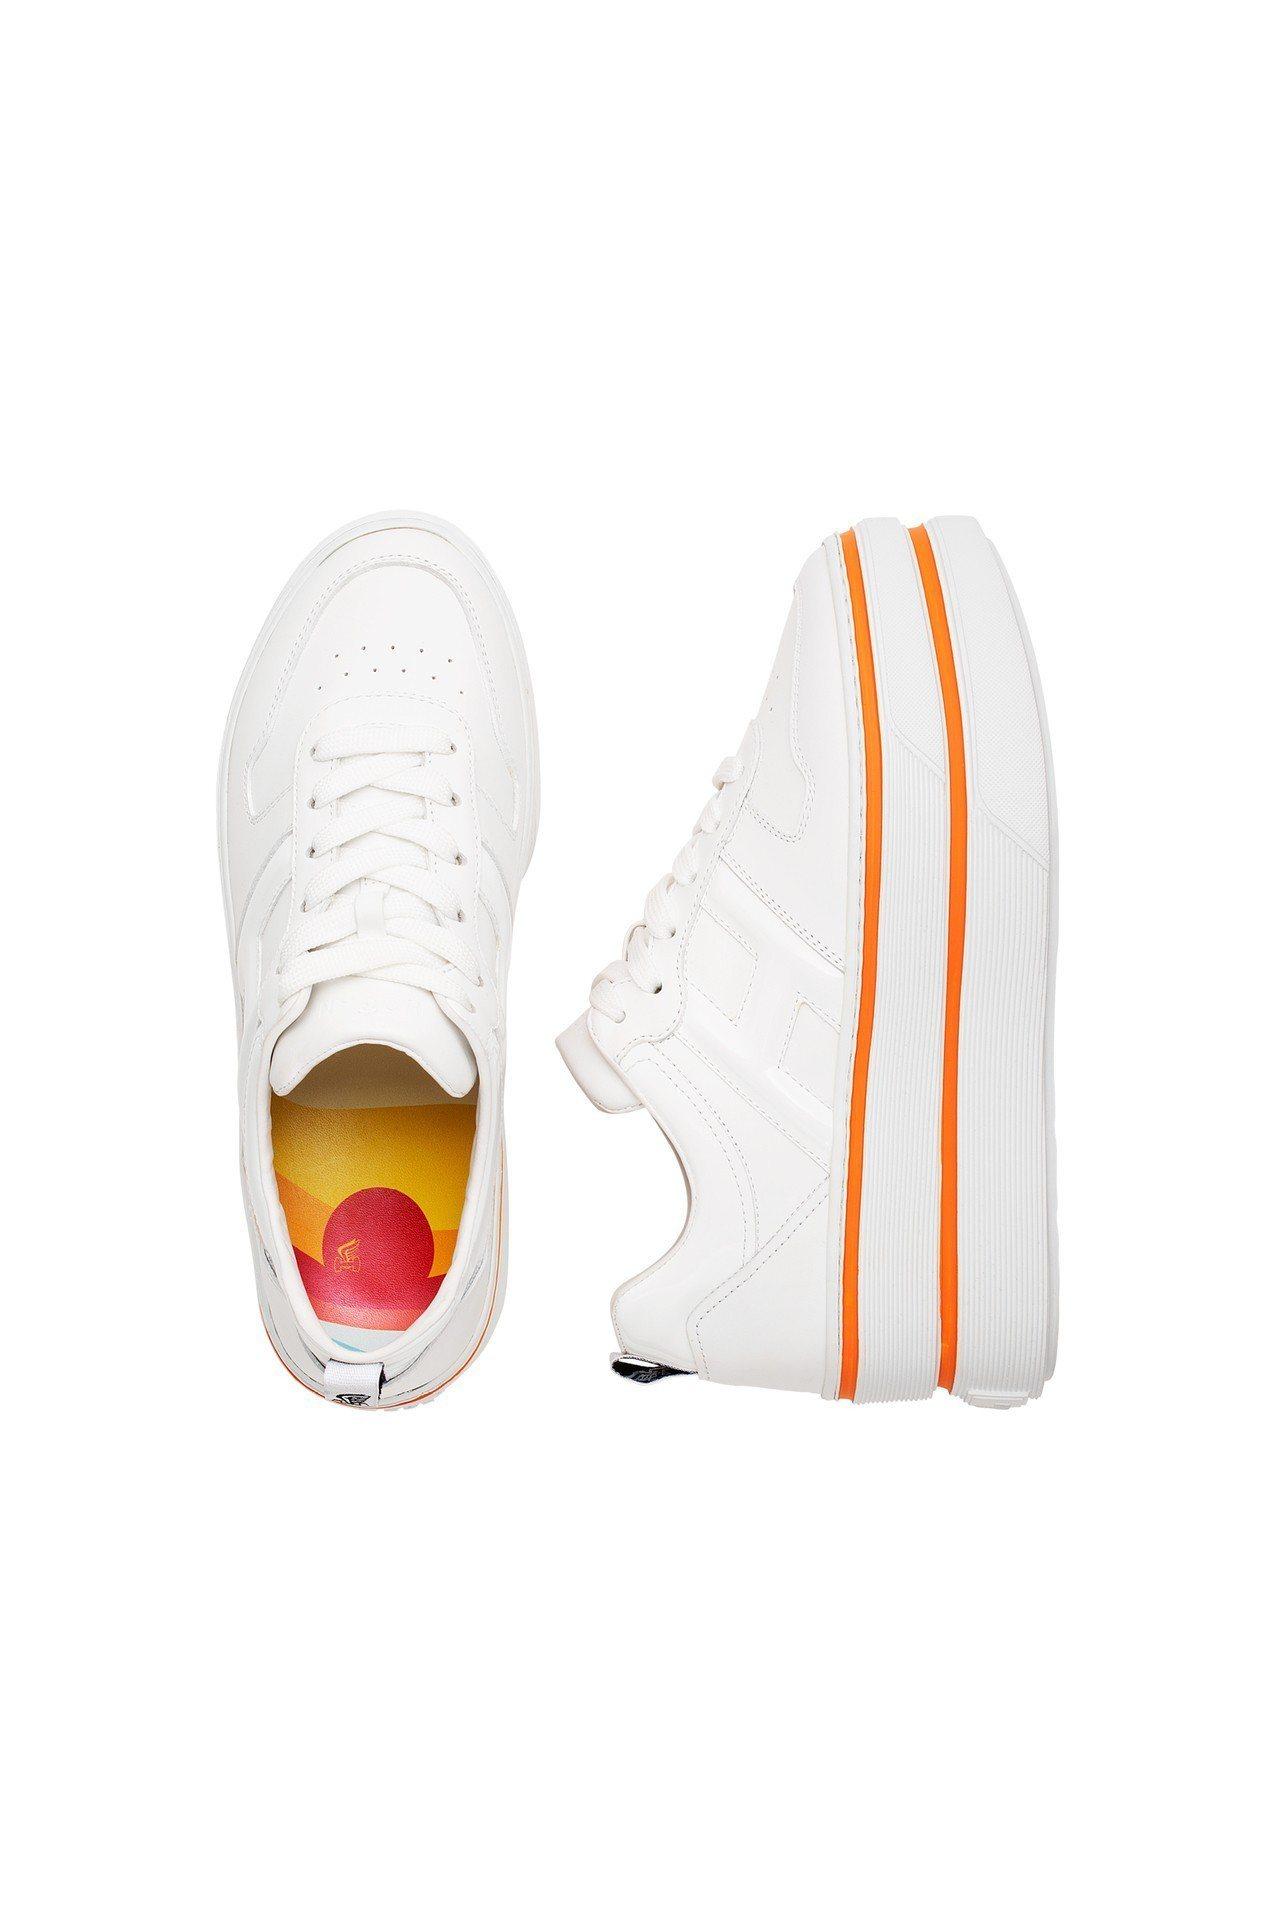 HOGAN MAXI CUPSOLE螢光橘女士休閒鞋,價格店洽。圖/迪生提供